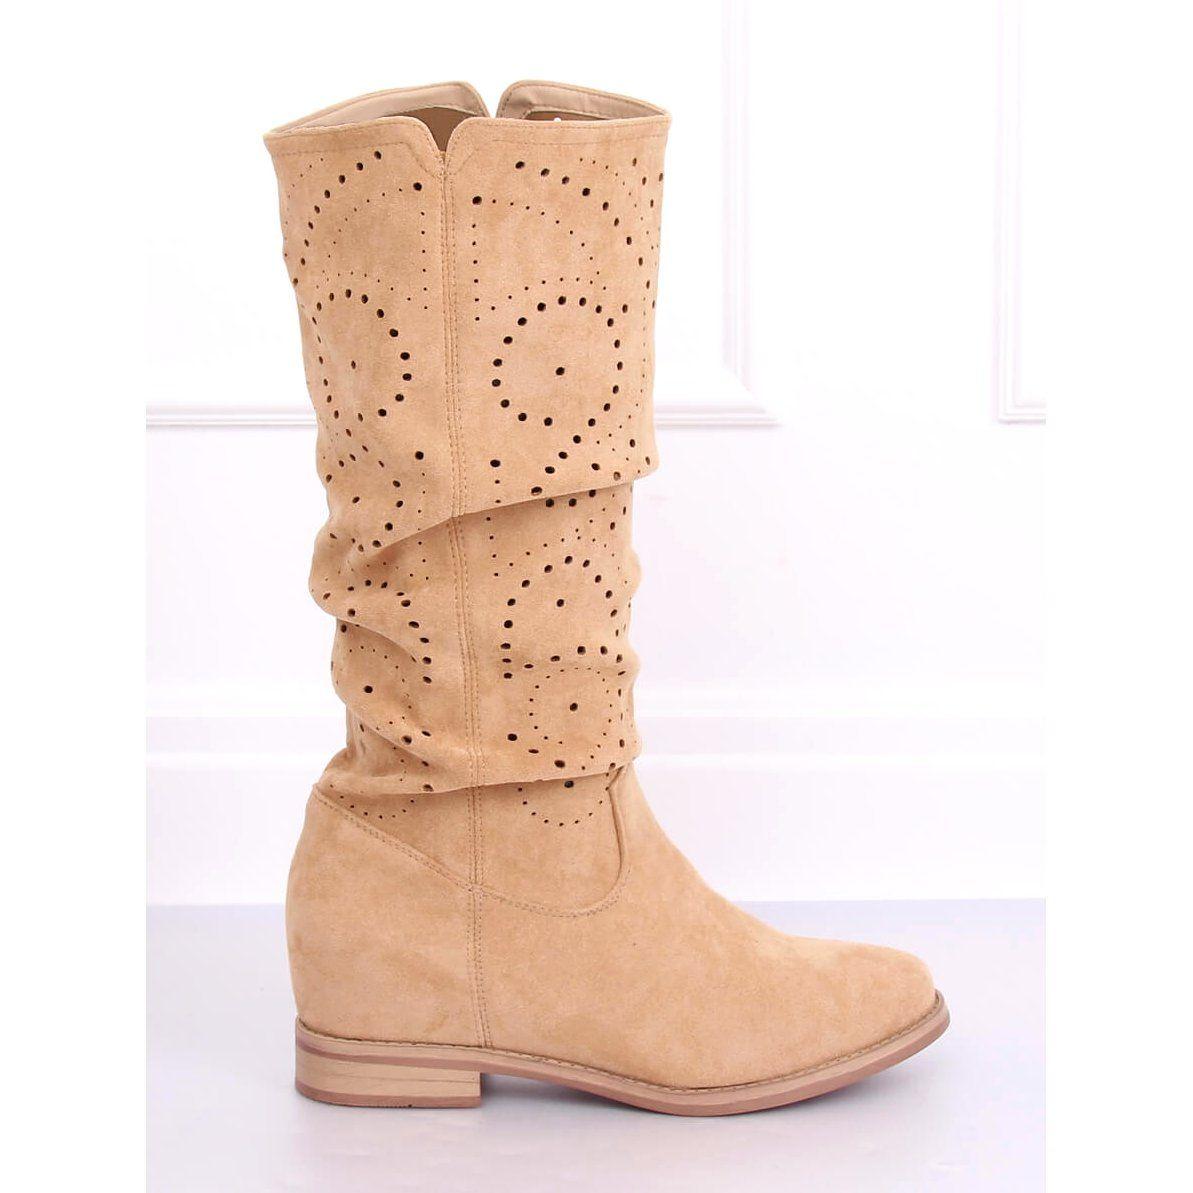 Kozaki Azurowe Na Koturnie Bezowe Nc1015 Beige Bezowy Boots Shoes Cowboy Boots